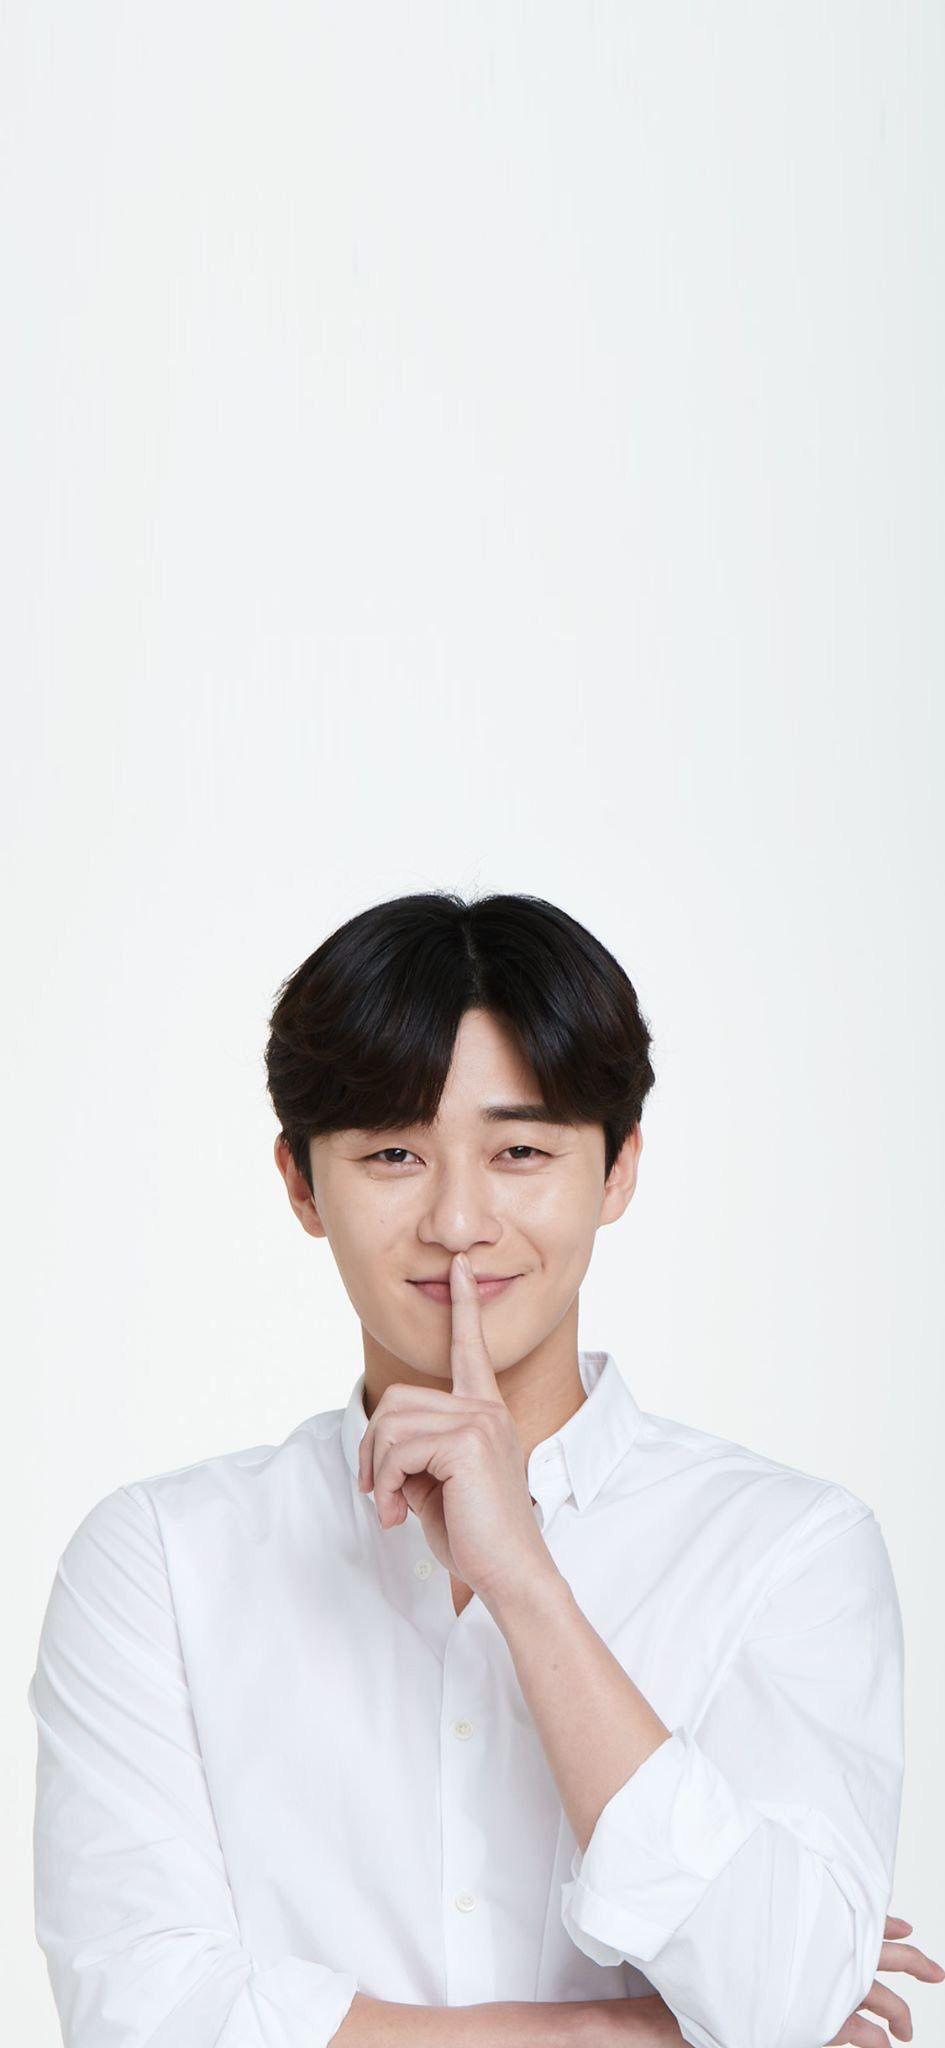 Park Seo Joon K Drama Actors Actrees In 2019 Seo Joon Park